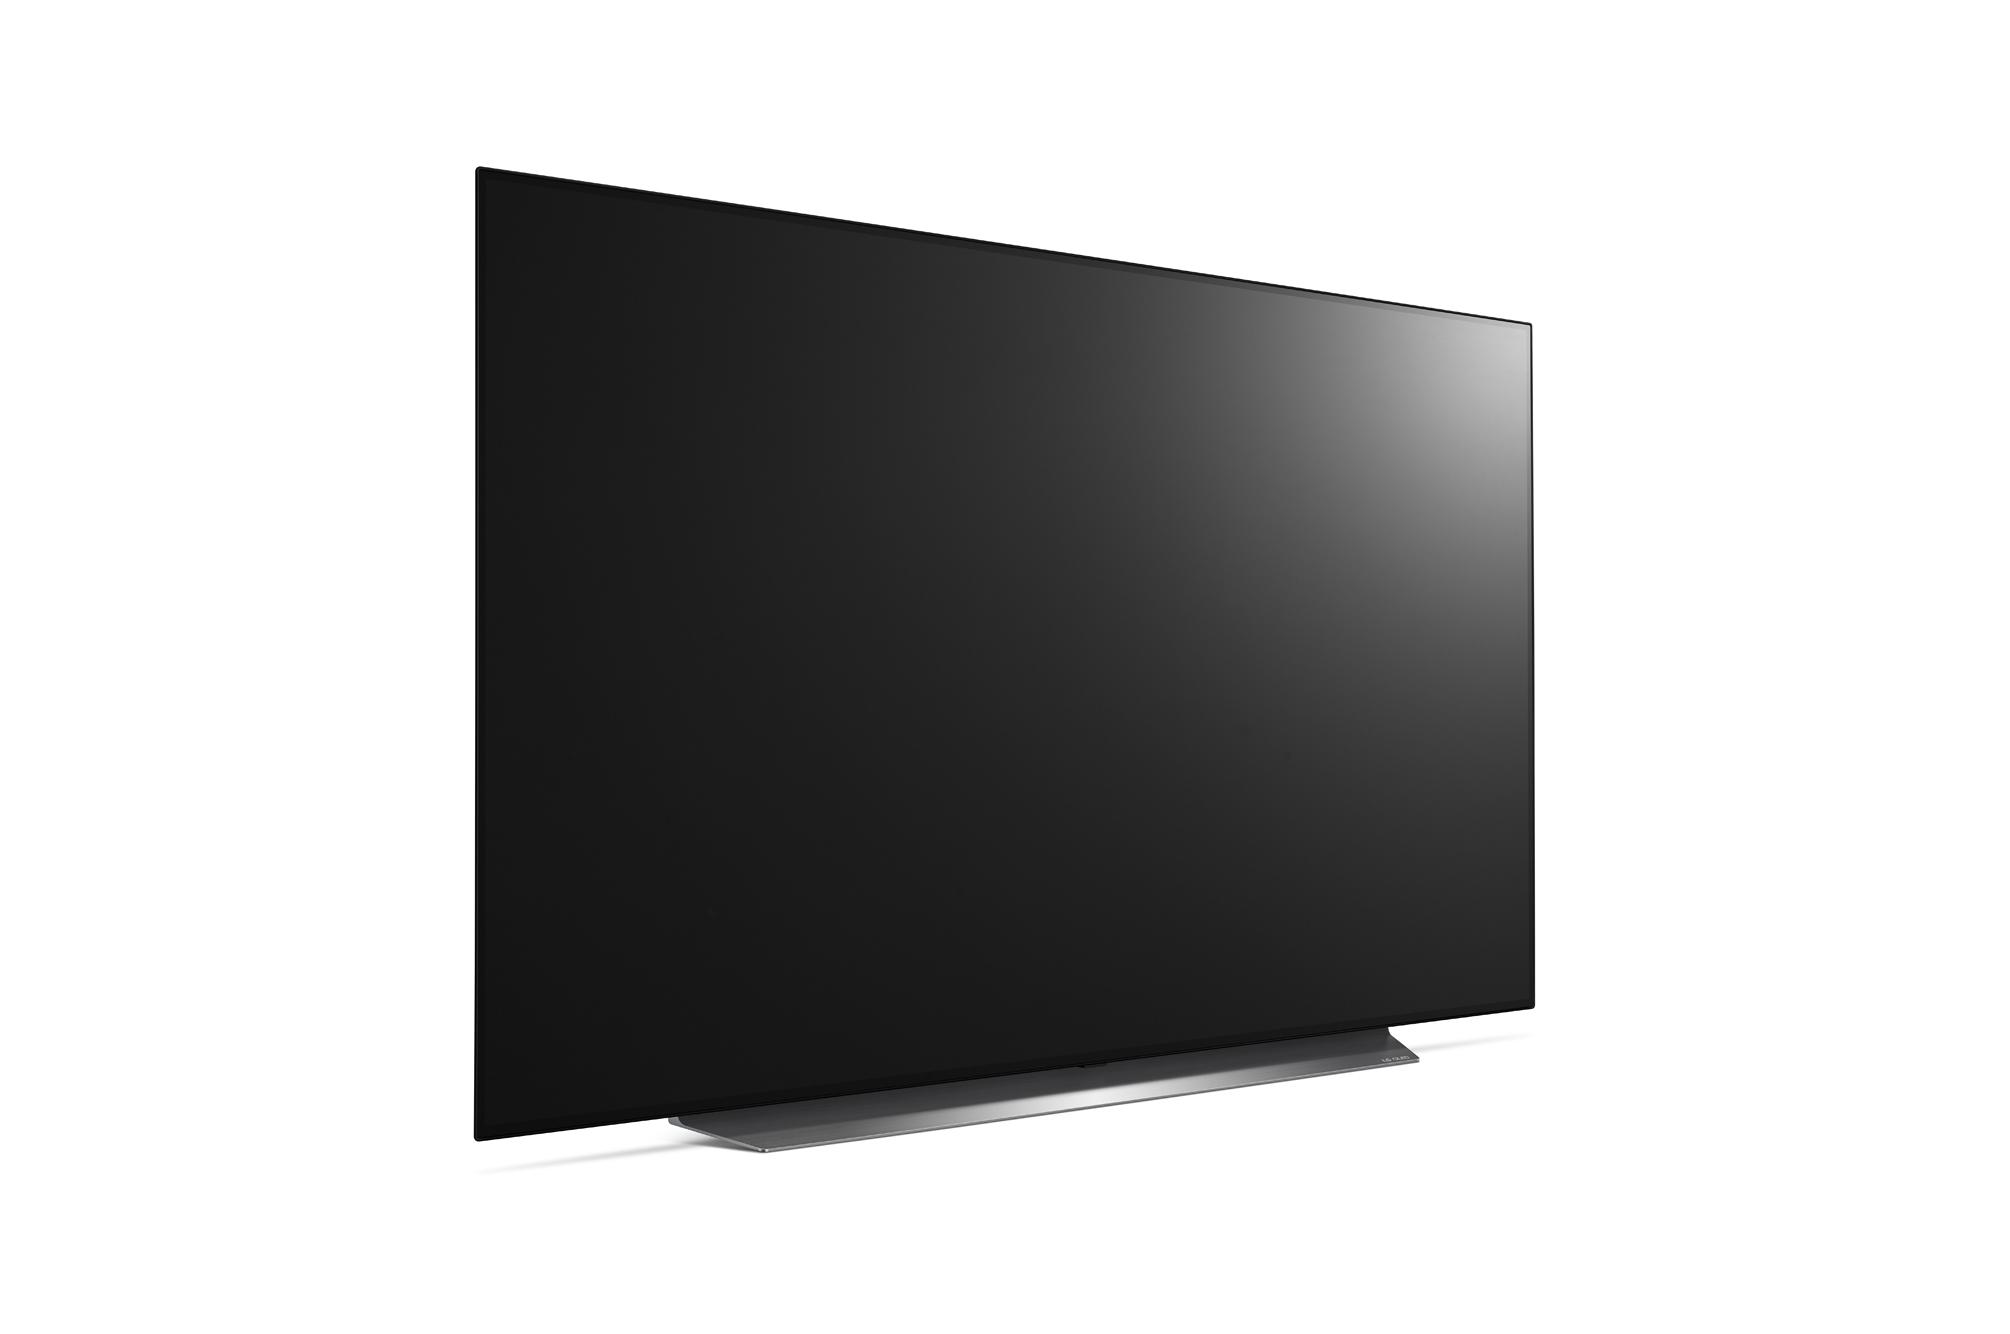 LG Pro:Centric SMART 65ET960H (NA) 6